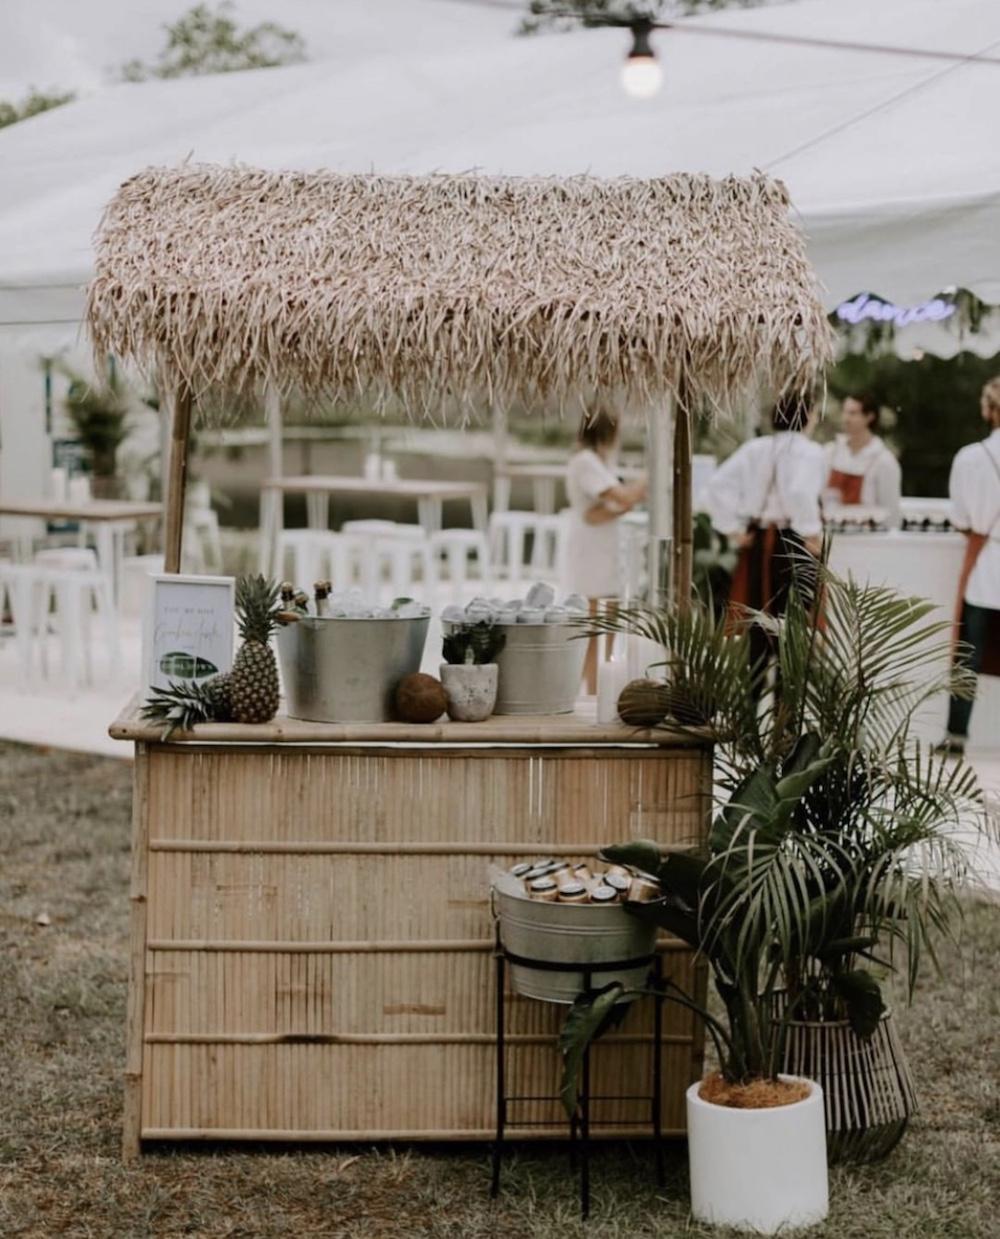 Wedding+Bar+Hire+Styling+Inspiration7.jpg